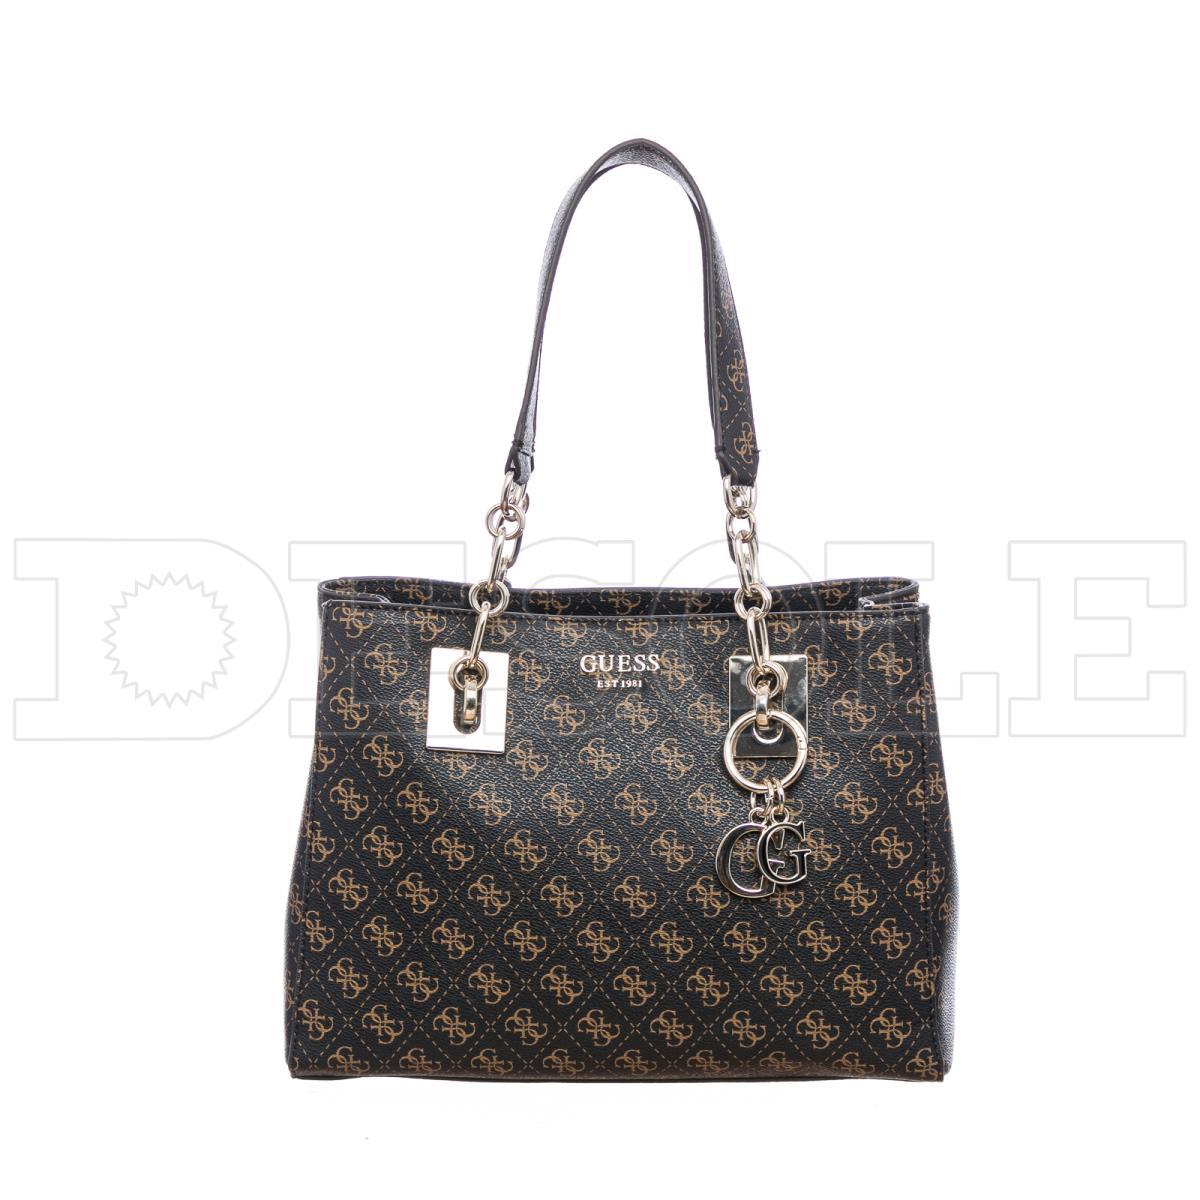 Guess Borsa hwmg6995230 | Desole Shop Online